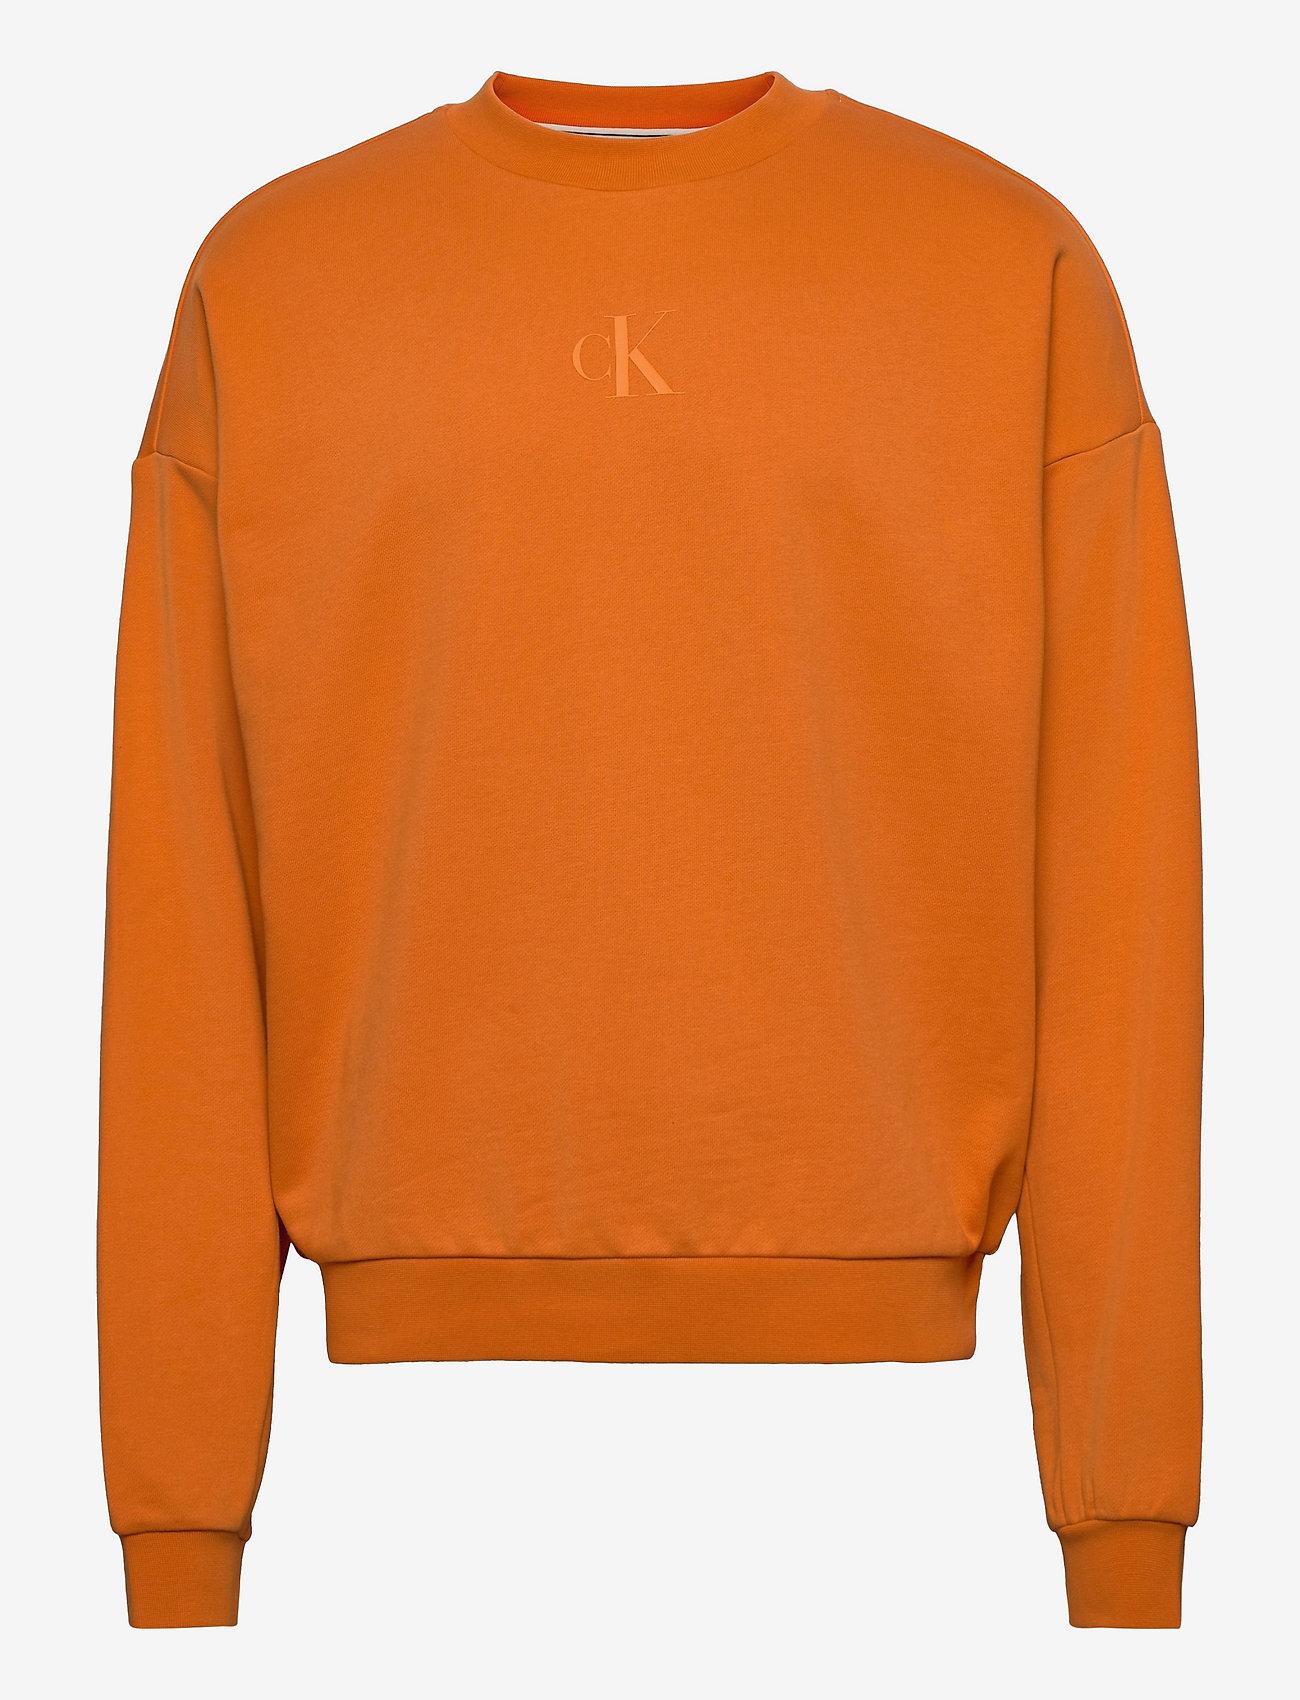 Calvin Klein Jeans - CK SLICED BACK GRAPHIC CN - sweats - rusty orange - 0